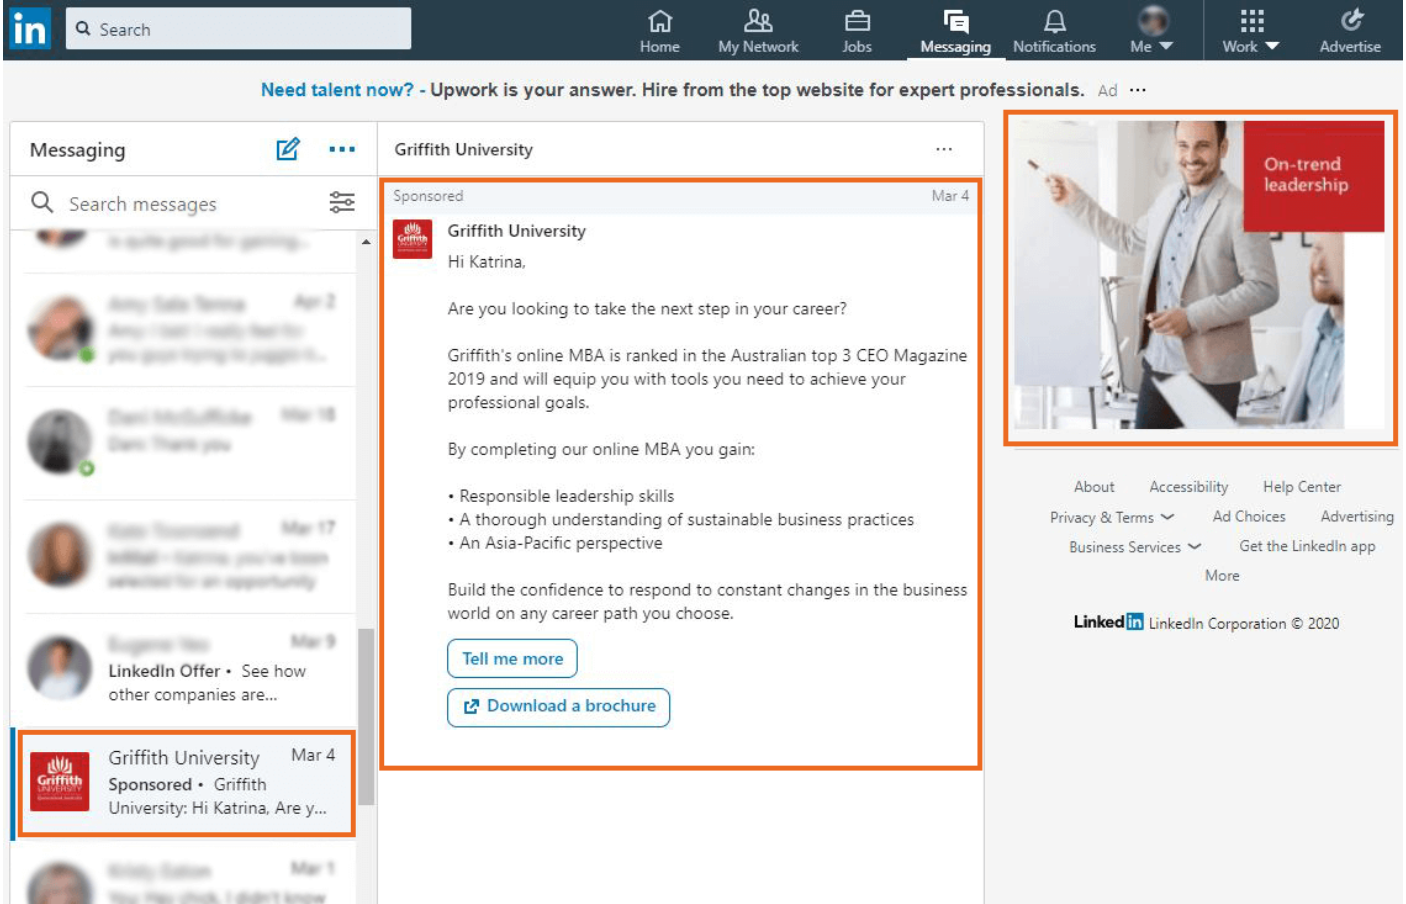 LinkedIn Ads Strategies 2